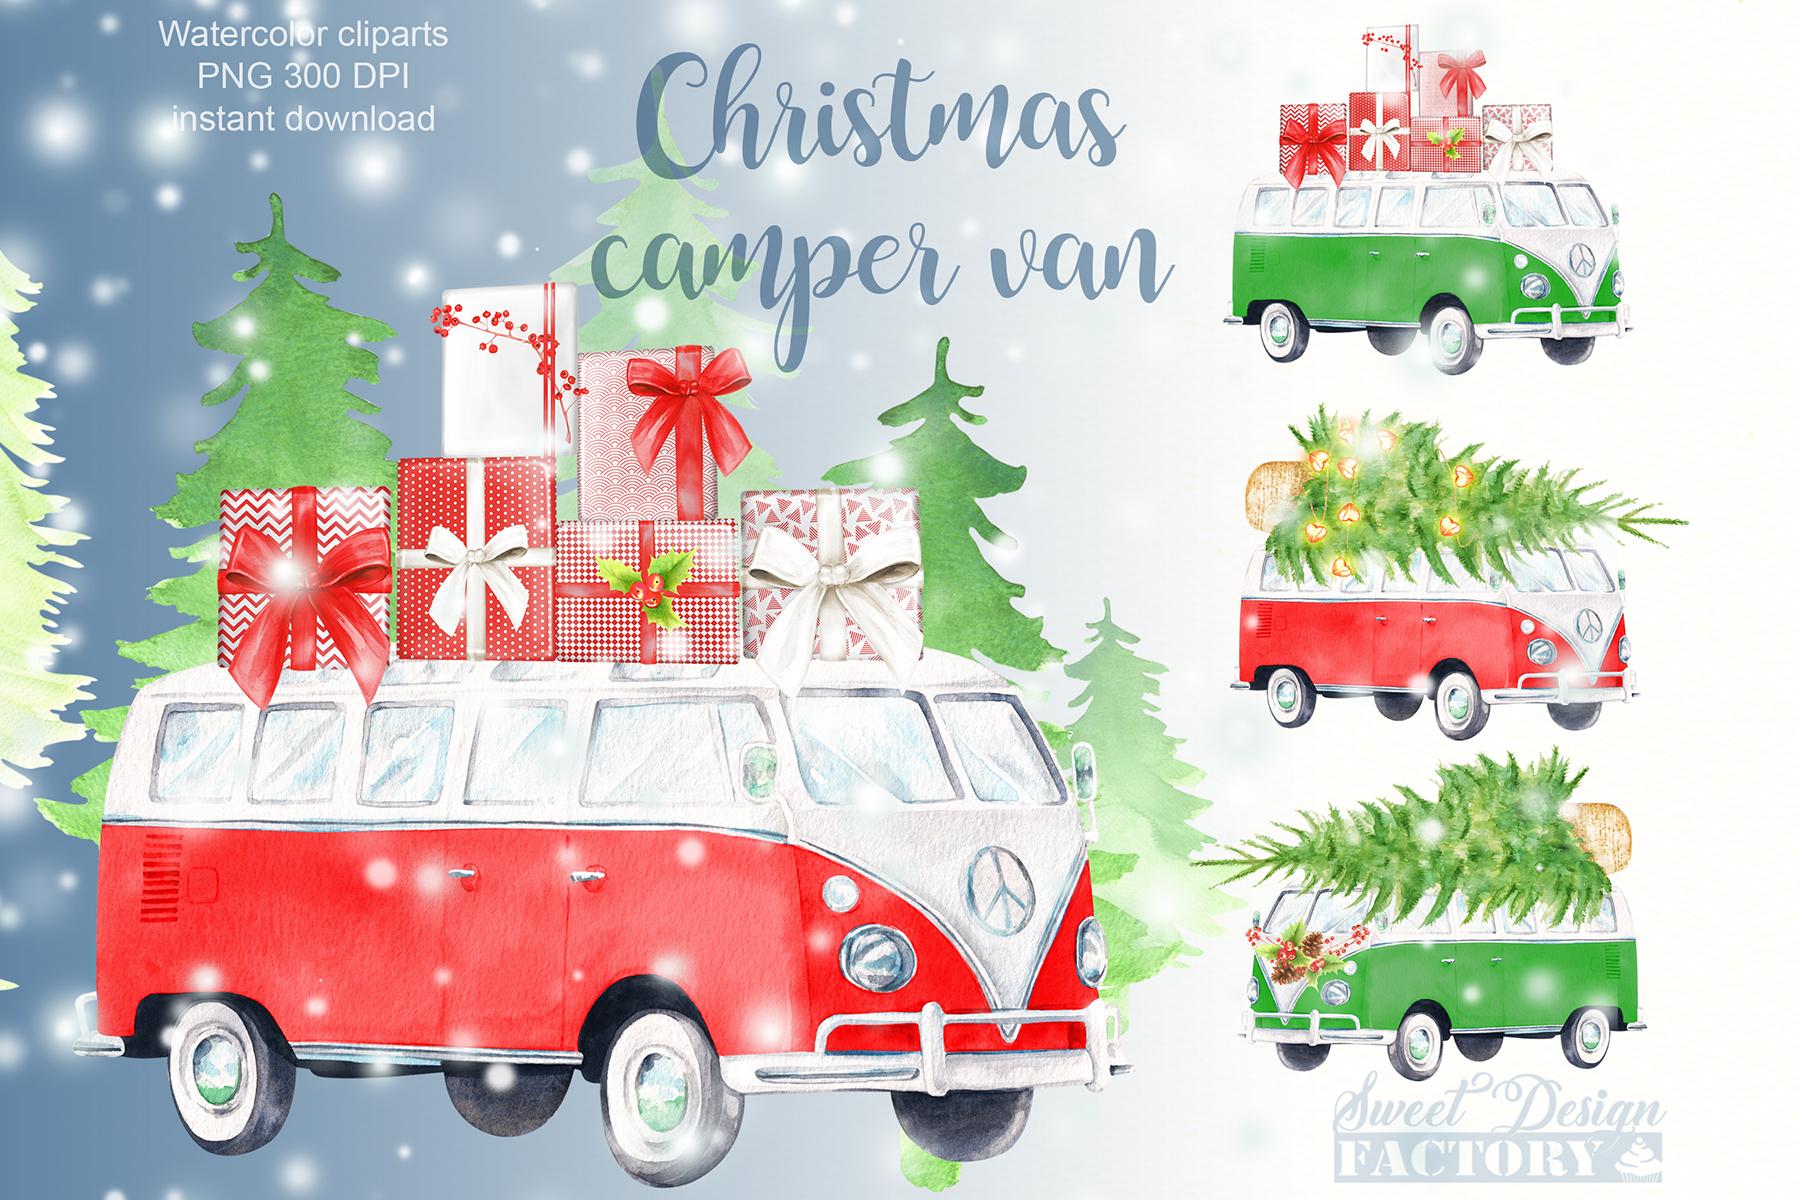 Watercolor Christmas retro van clipart example image 1